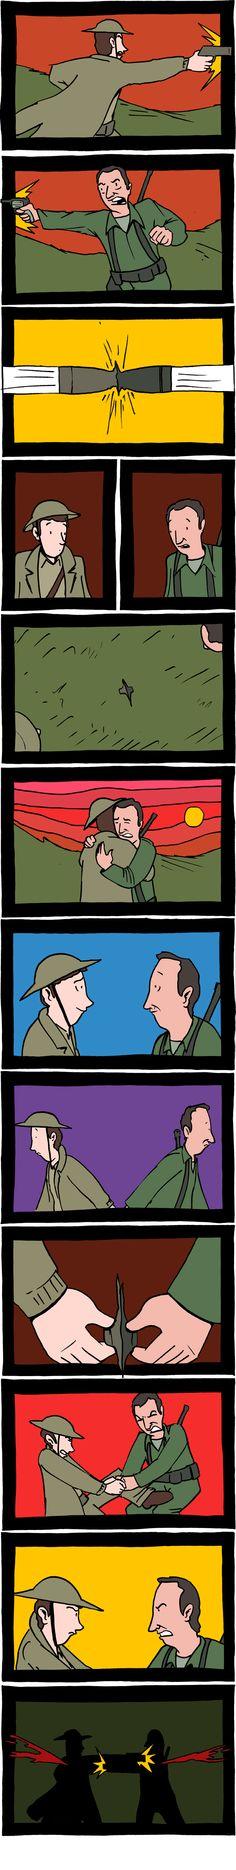 Peace and War | SMBC